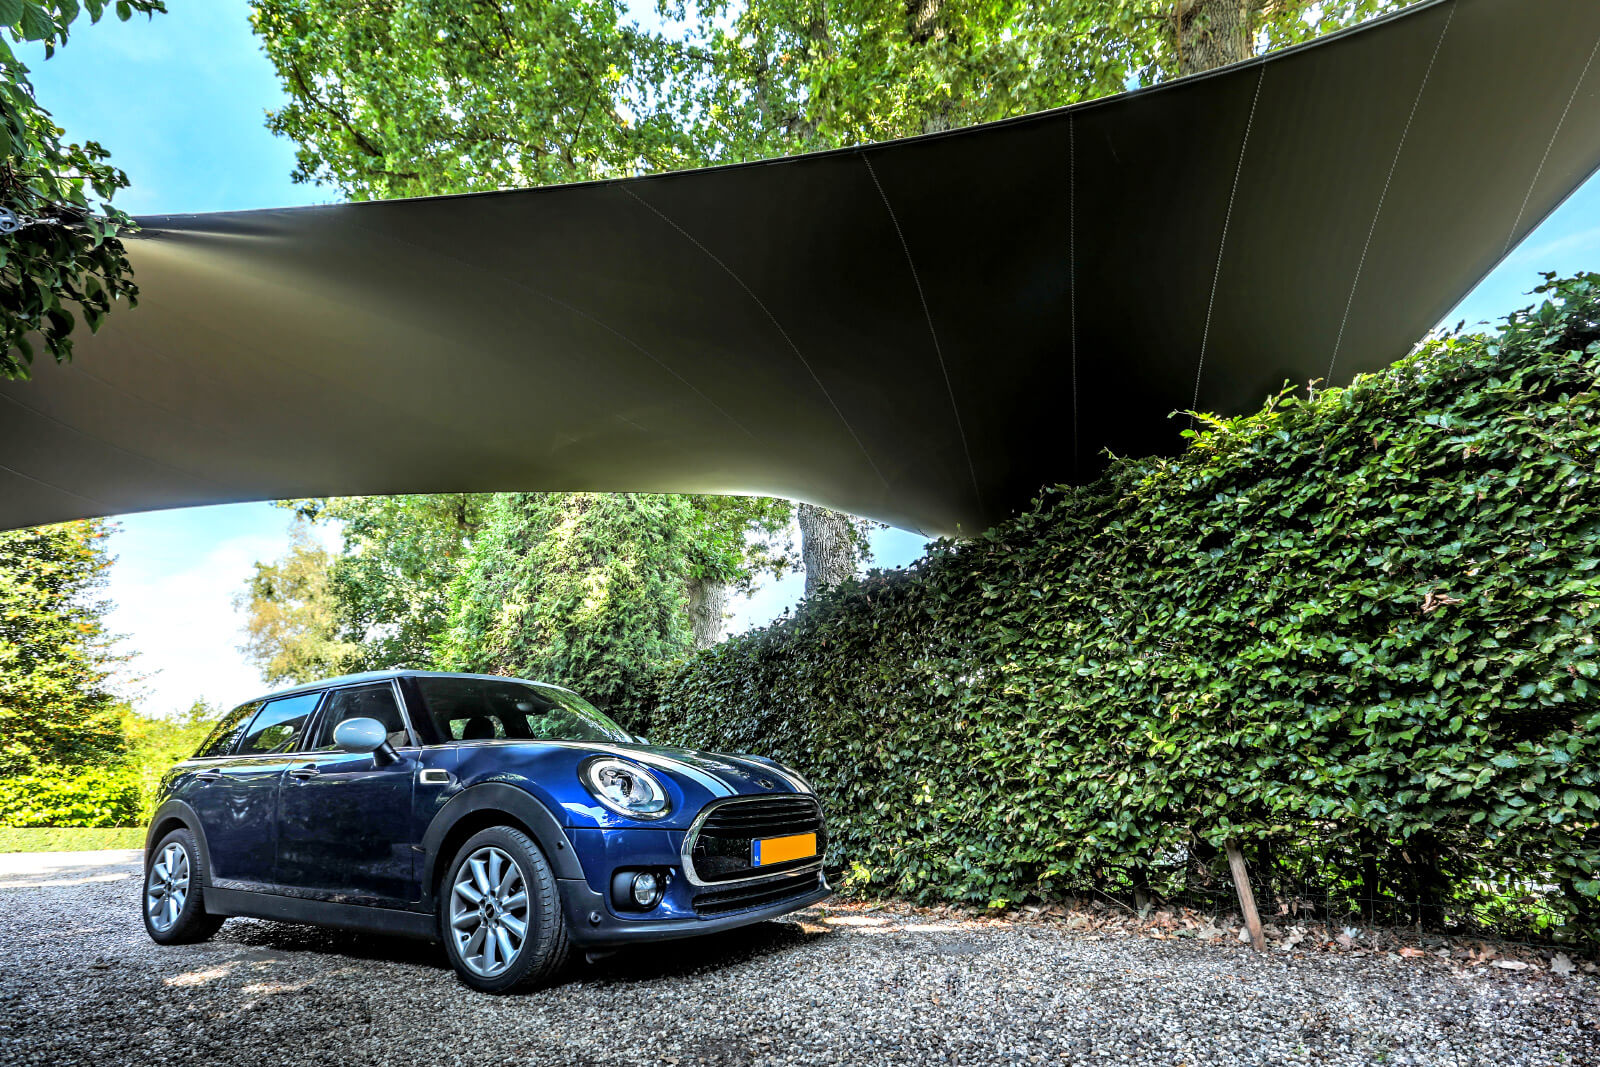 Texsyleroofs carport; The best canopy carport cover ...